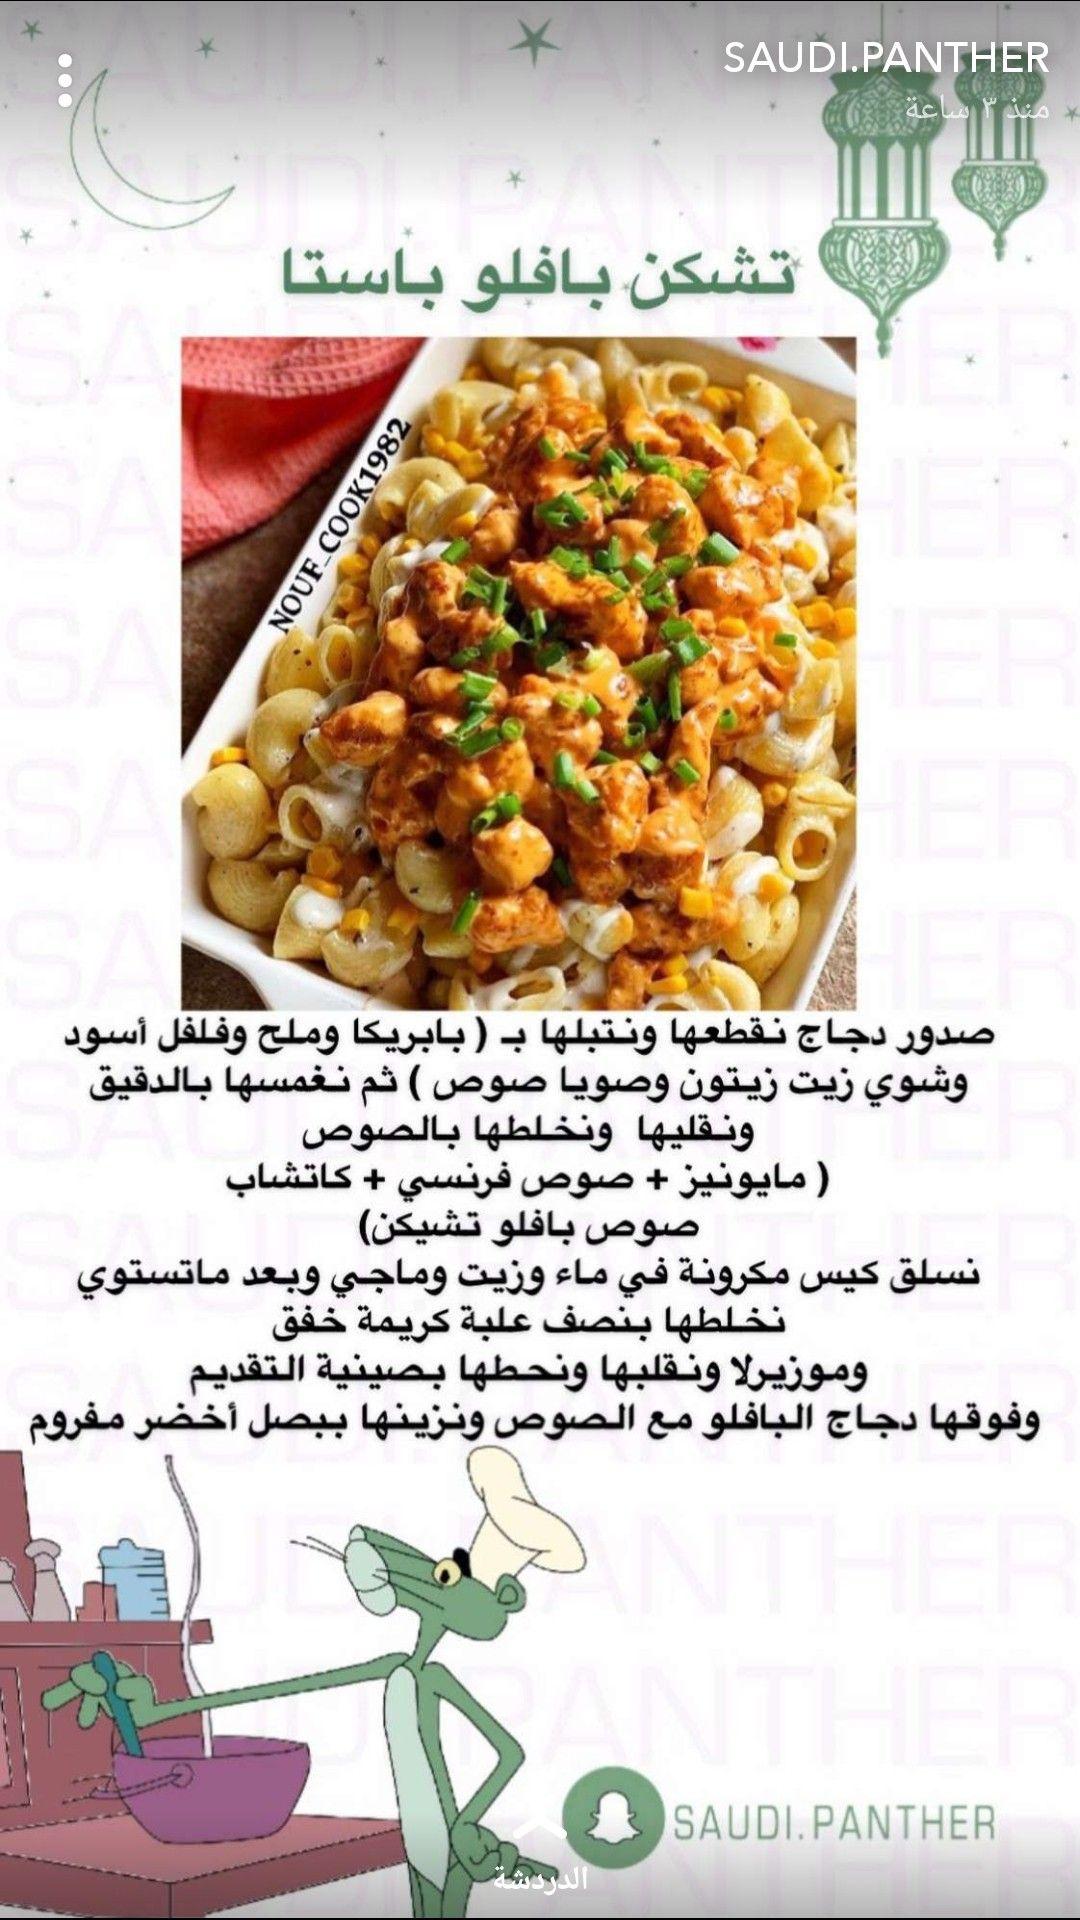 Pin By Sana Azhary On طبخات وضيافة عربية وعالمية Cookout Food Food Receipes Food Recipies